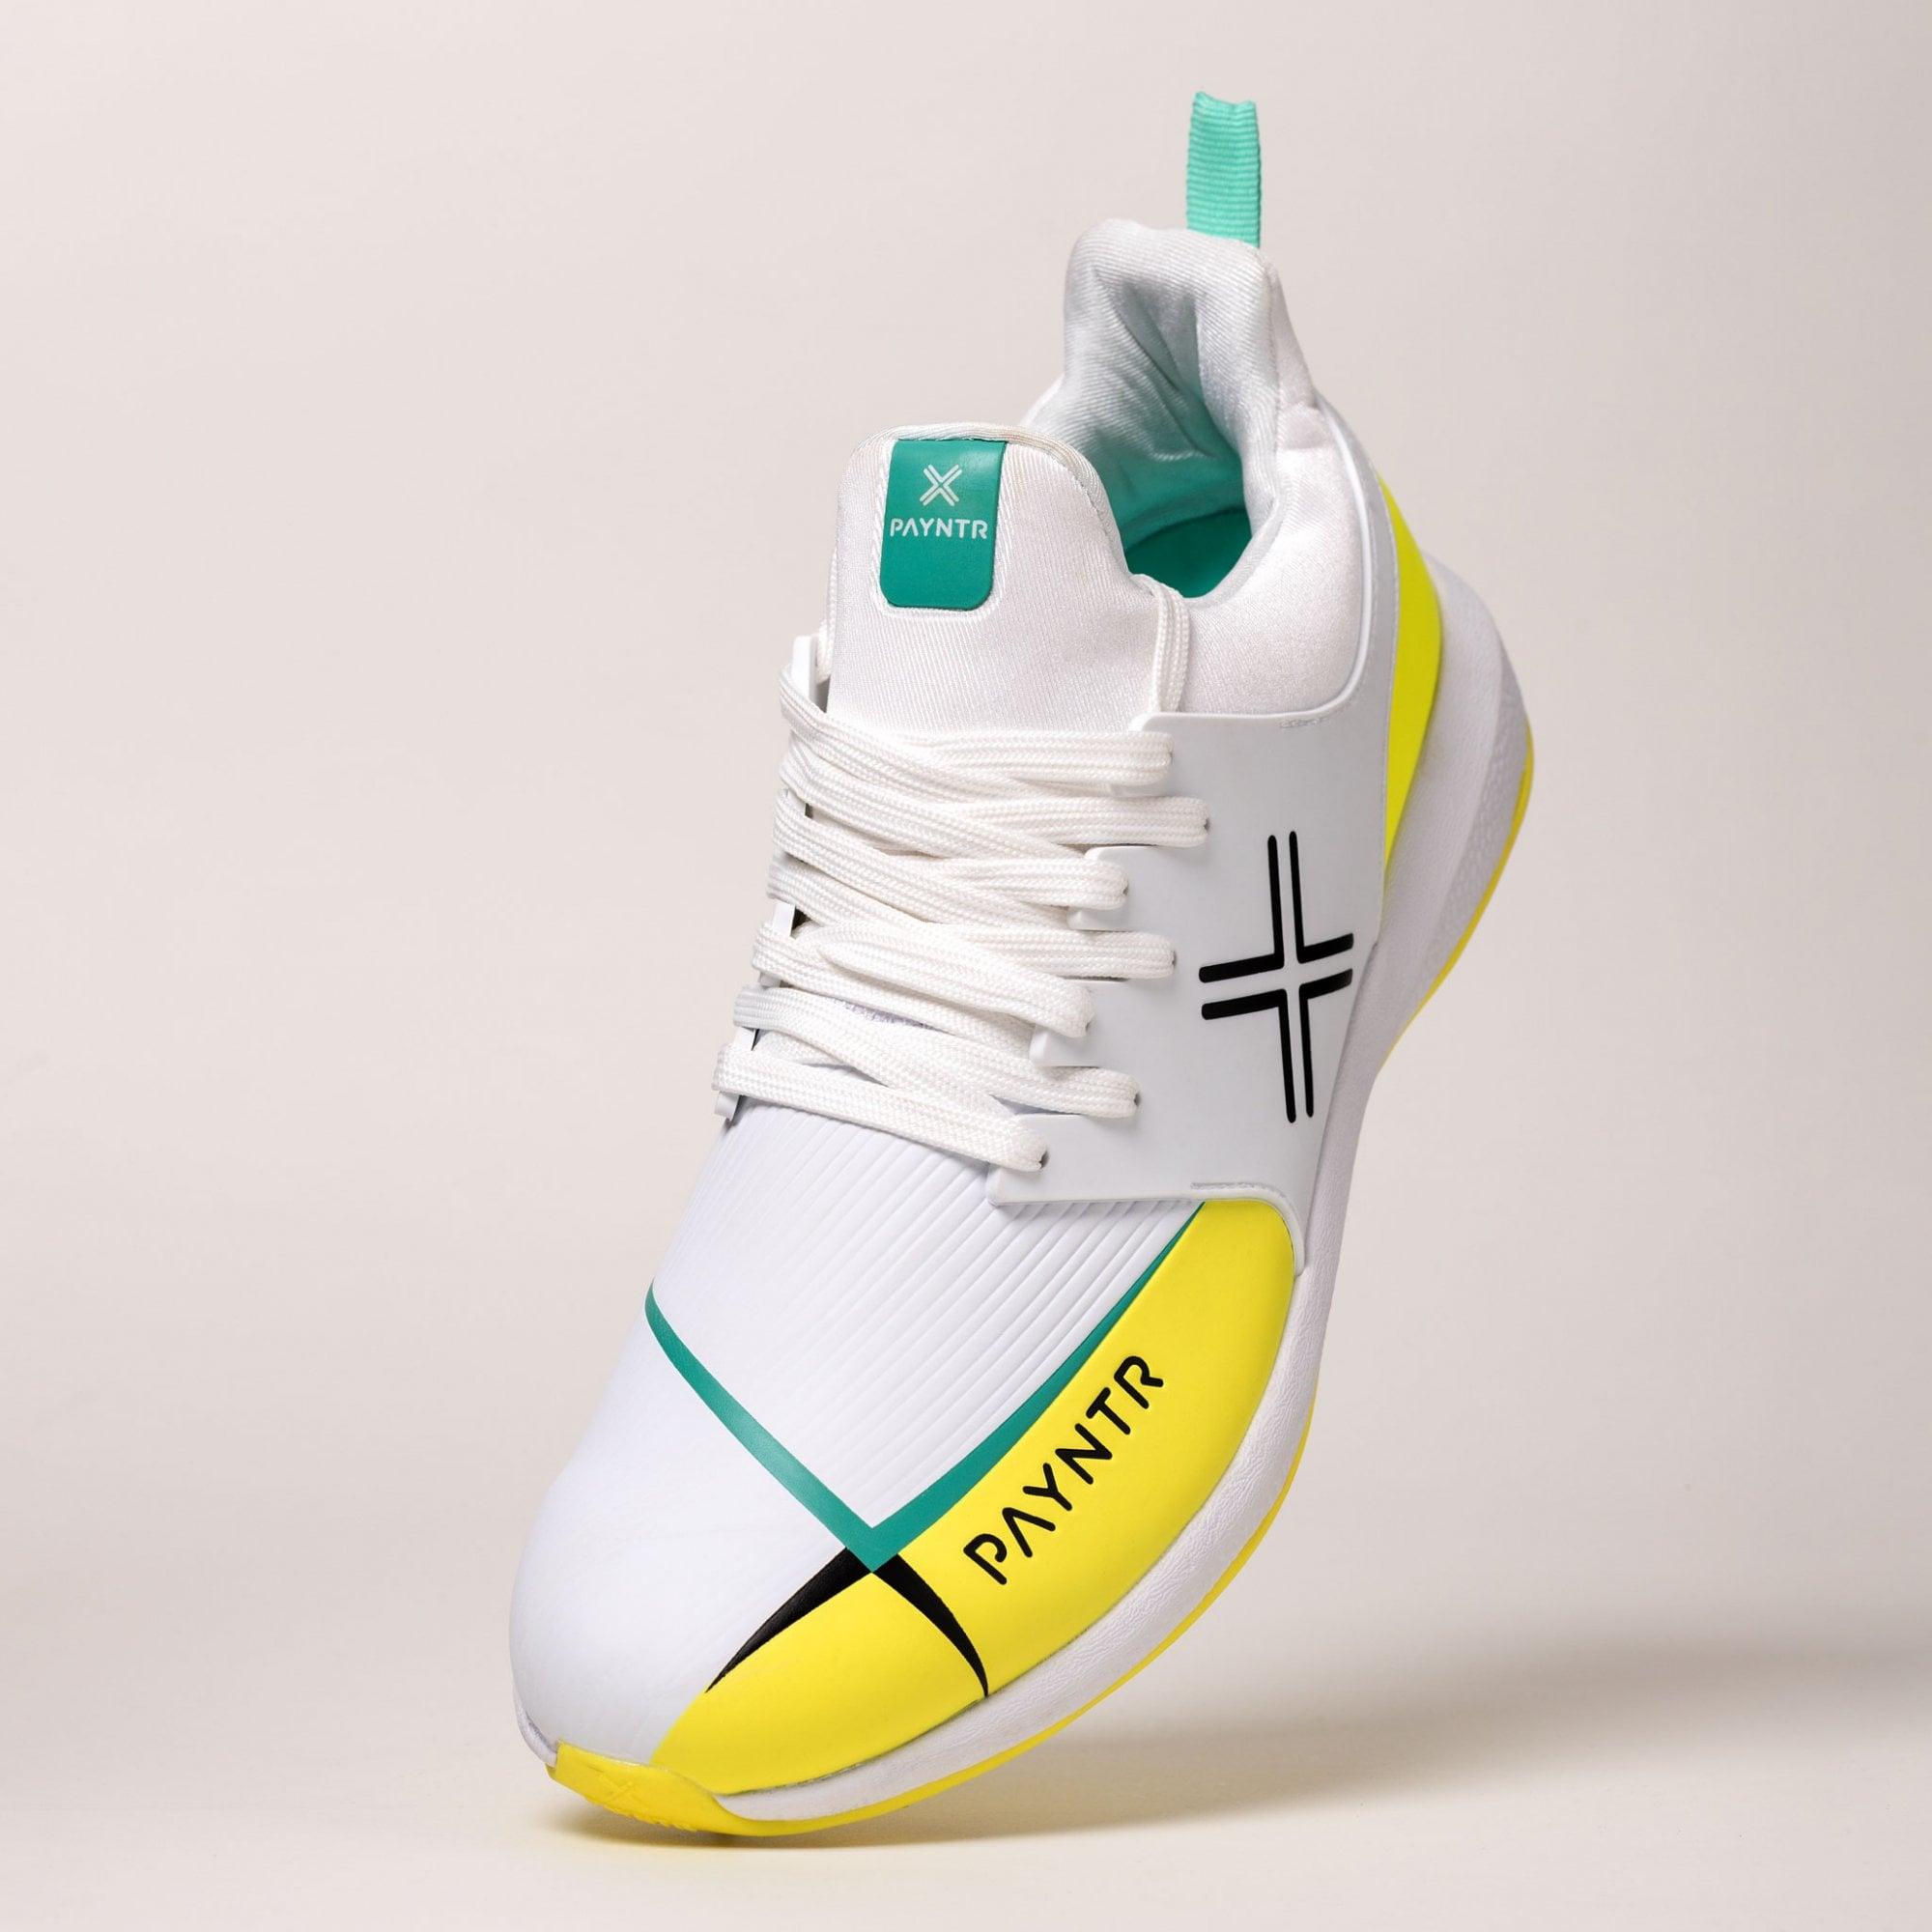 PAYNTR EVO Pimple Cricket Shoes Black /& Yellow